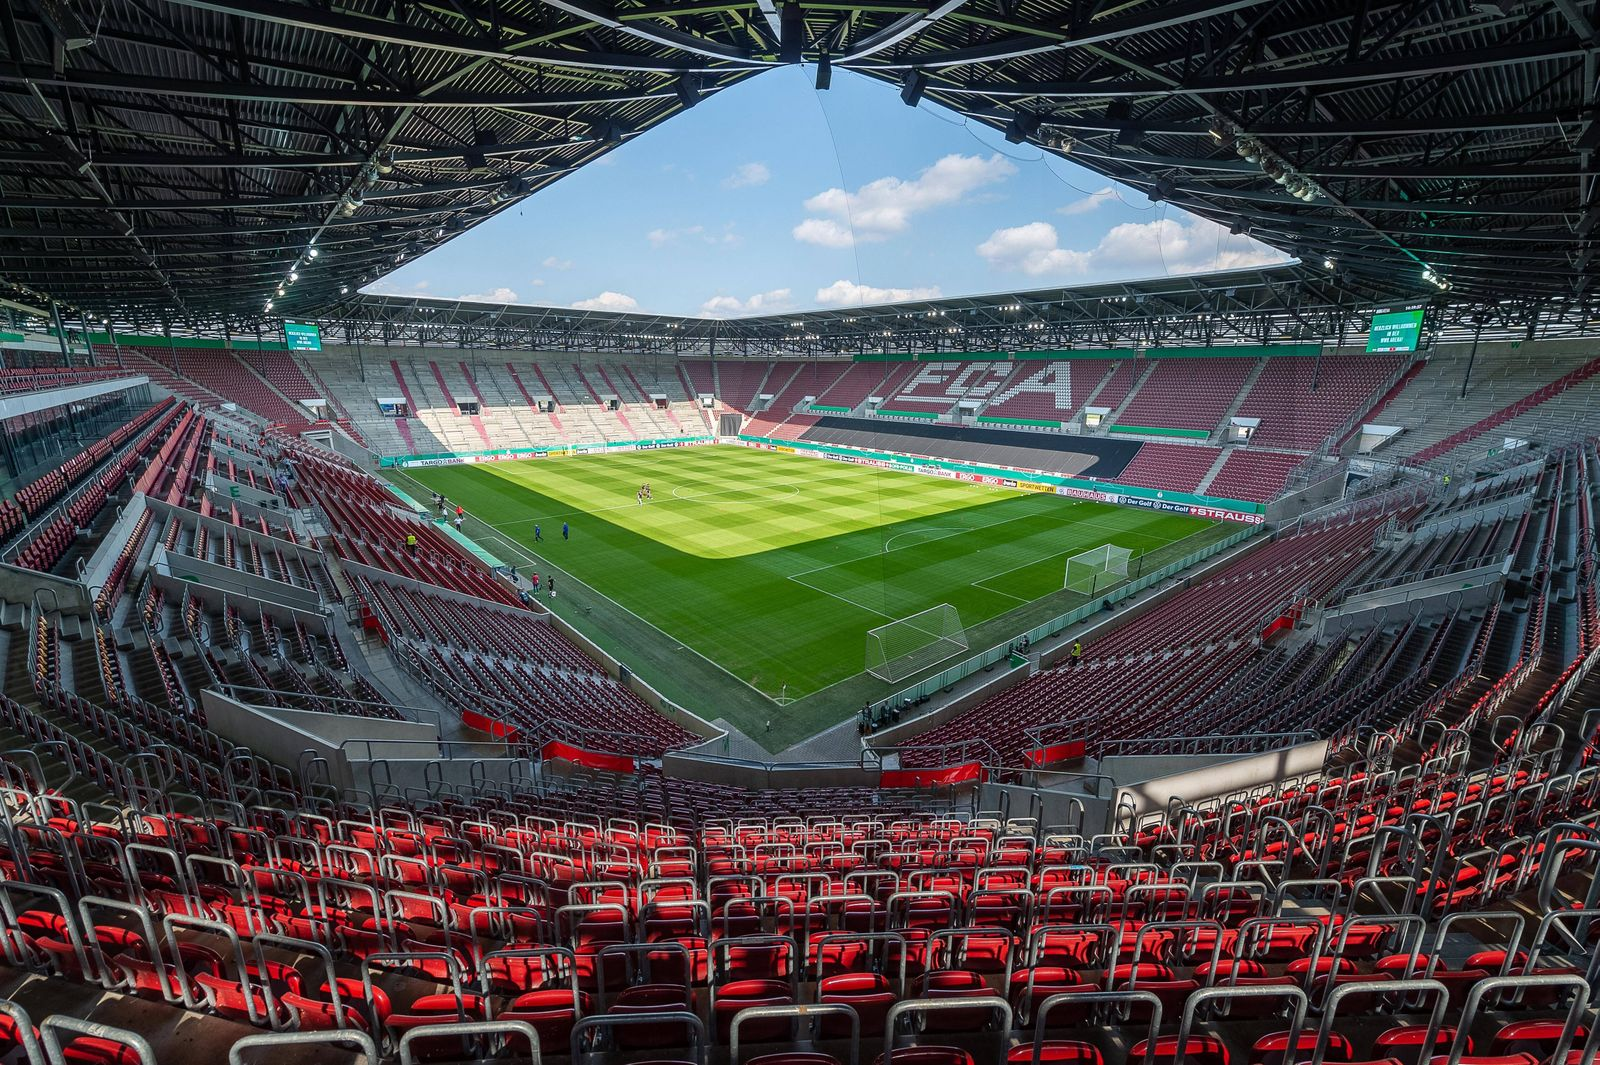 Geisterspiel, leere Raenge, keine Fans, leeres Stadion, MTV Eintracht Celle vs. FC Augsburg, Fussball, Herren, DFB-Poka